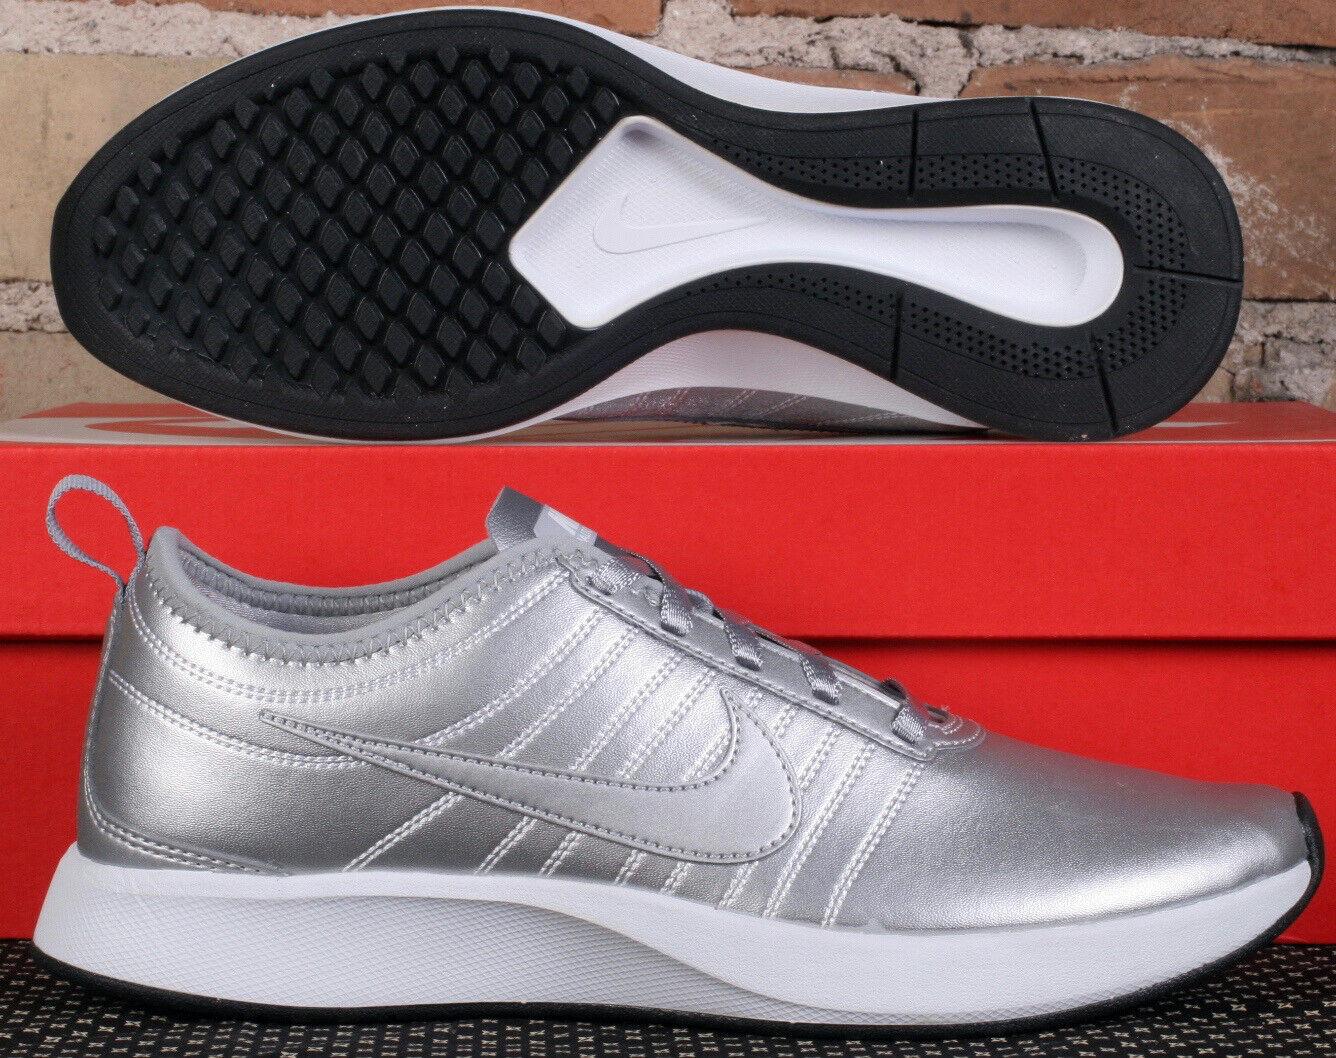 donna Nike  Dualstone Racer PRM Metallic argento Running scarpe AH0312 001 Dimensione 7.5  preferenziale